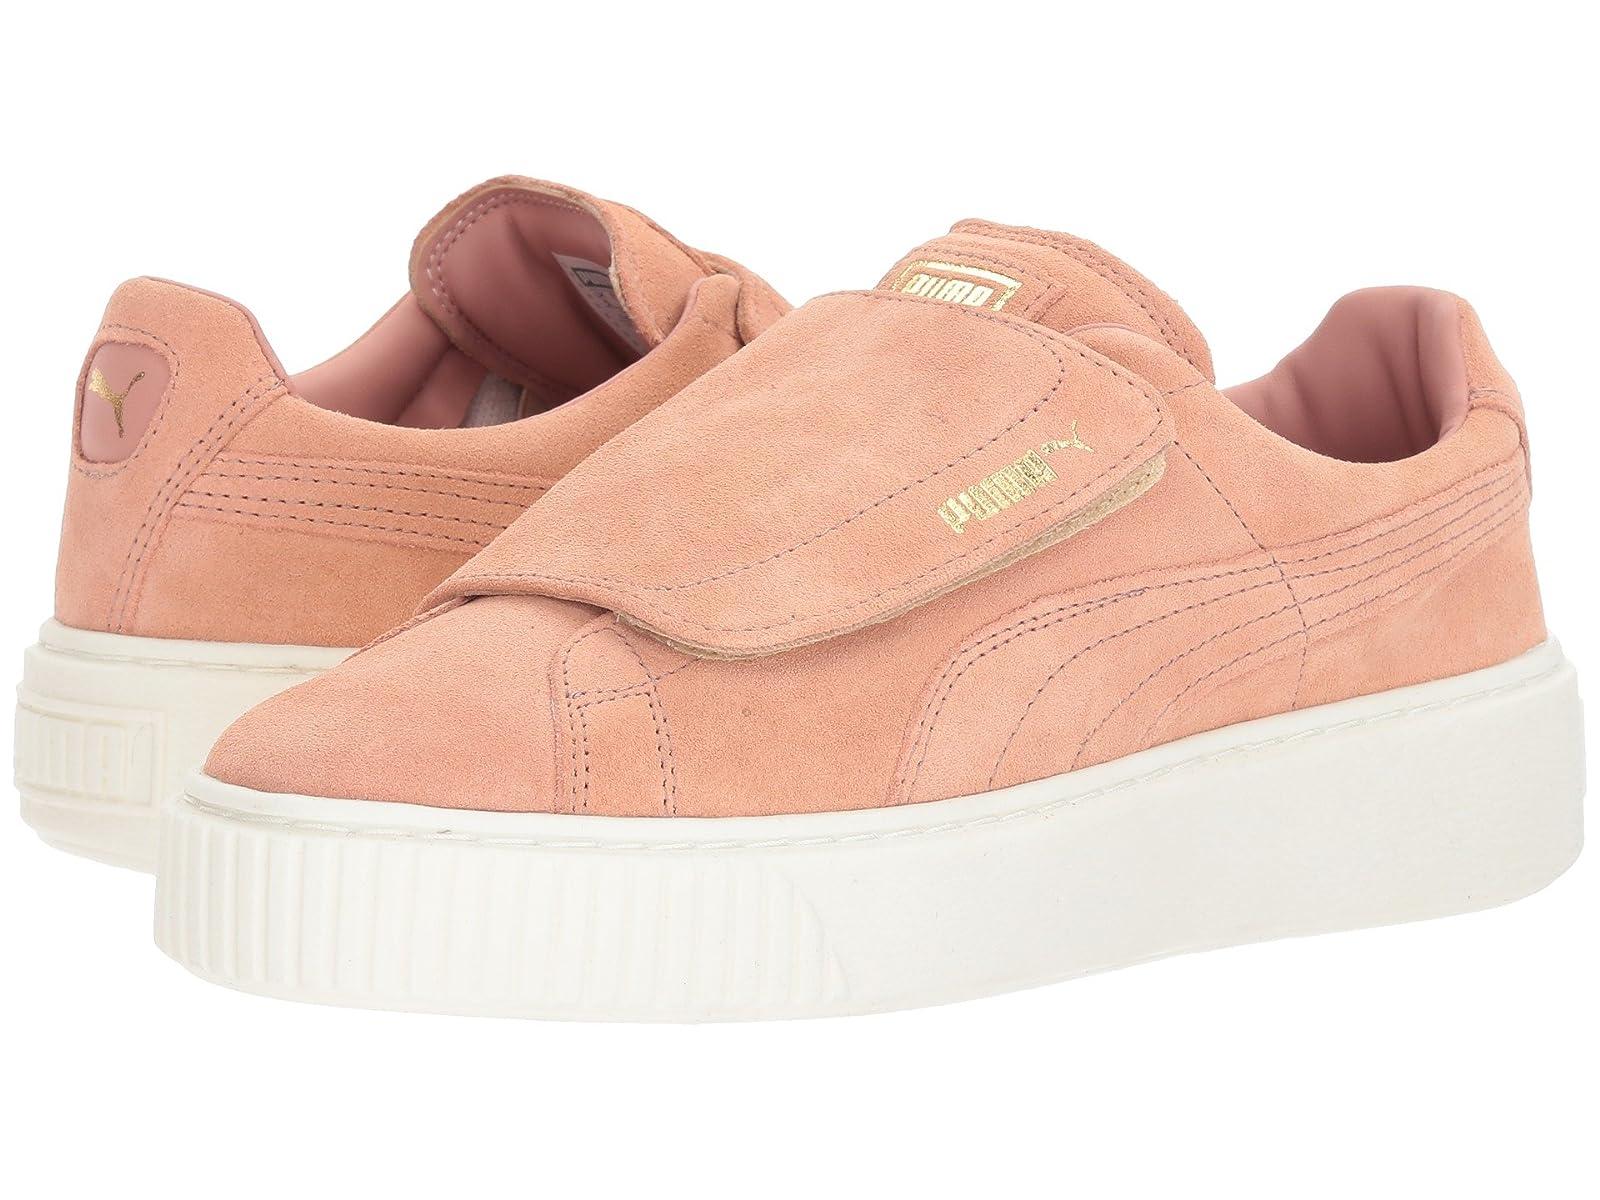 PUMA Suede Platform StrapCheap and distinctive eye-catching shoes